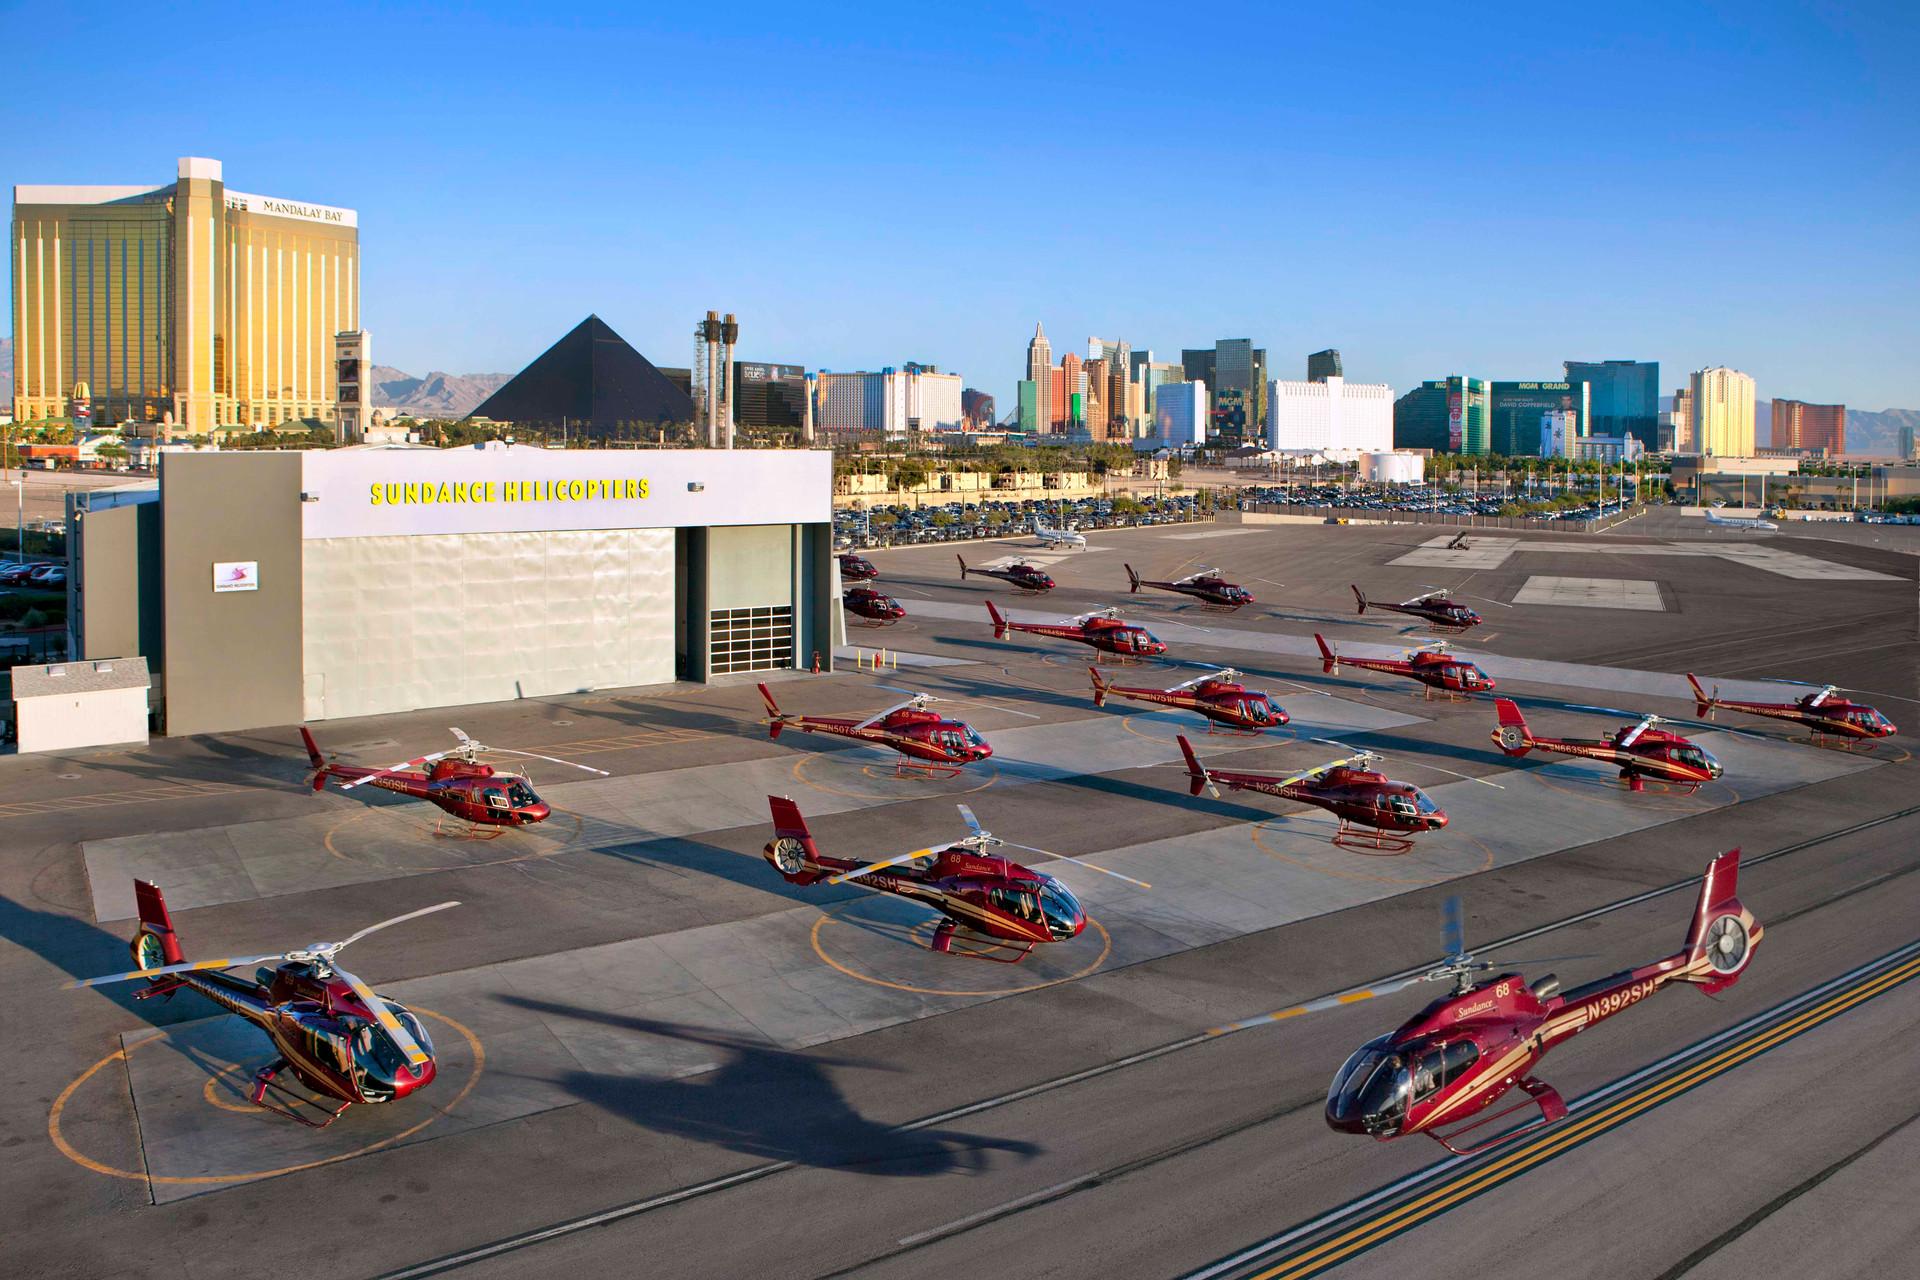 Sundance Helicopter Fleet